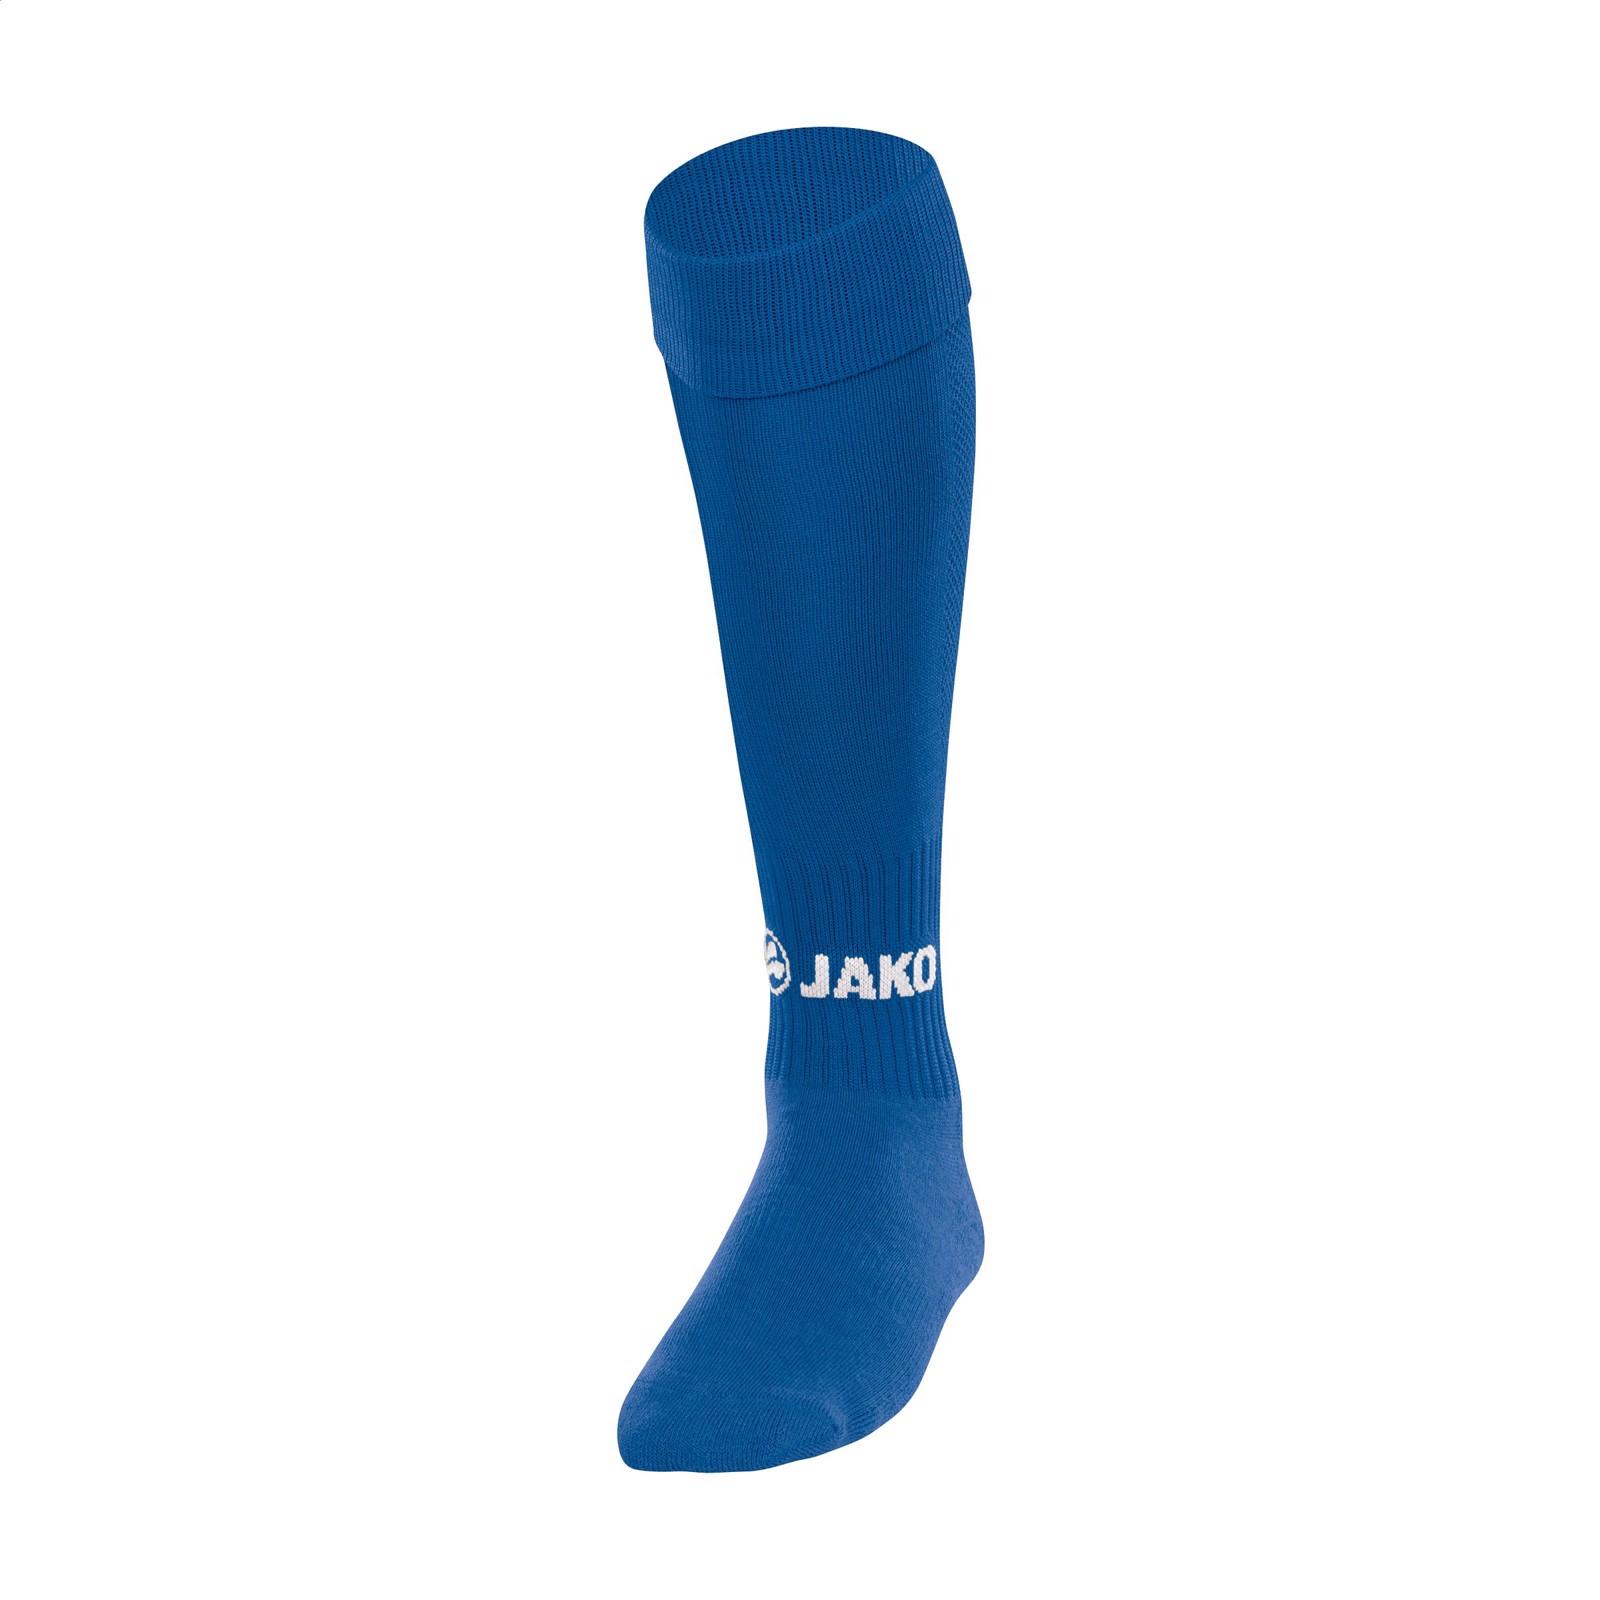 Jako® Glasgow Sport Socks  2.0 Adults - Cobalt Blue / S